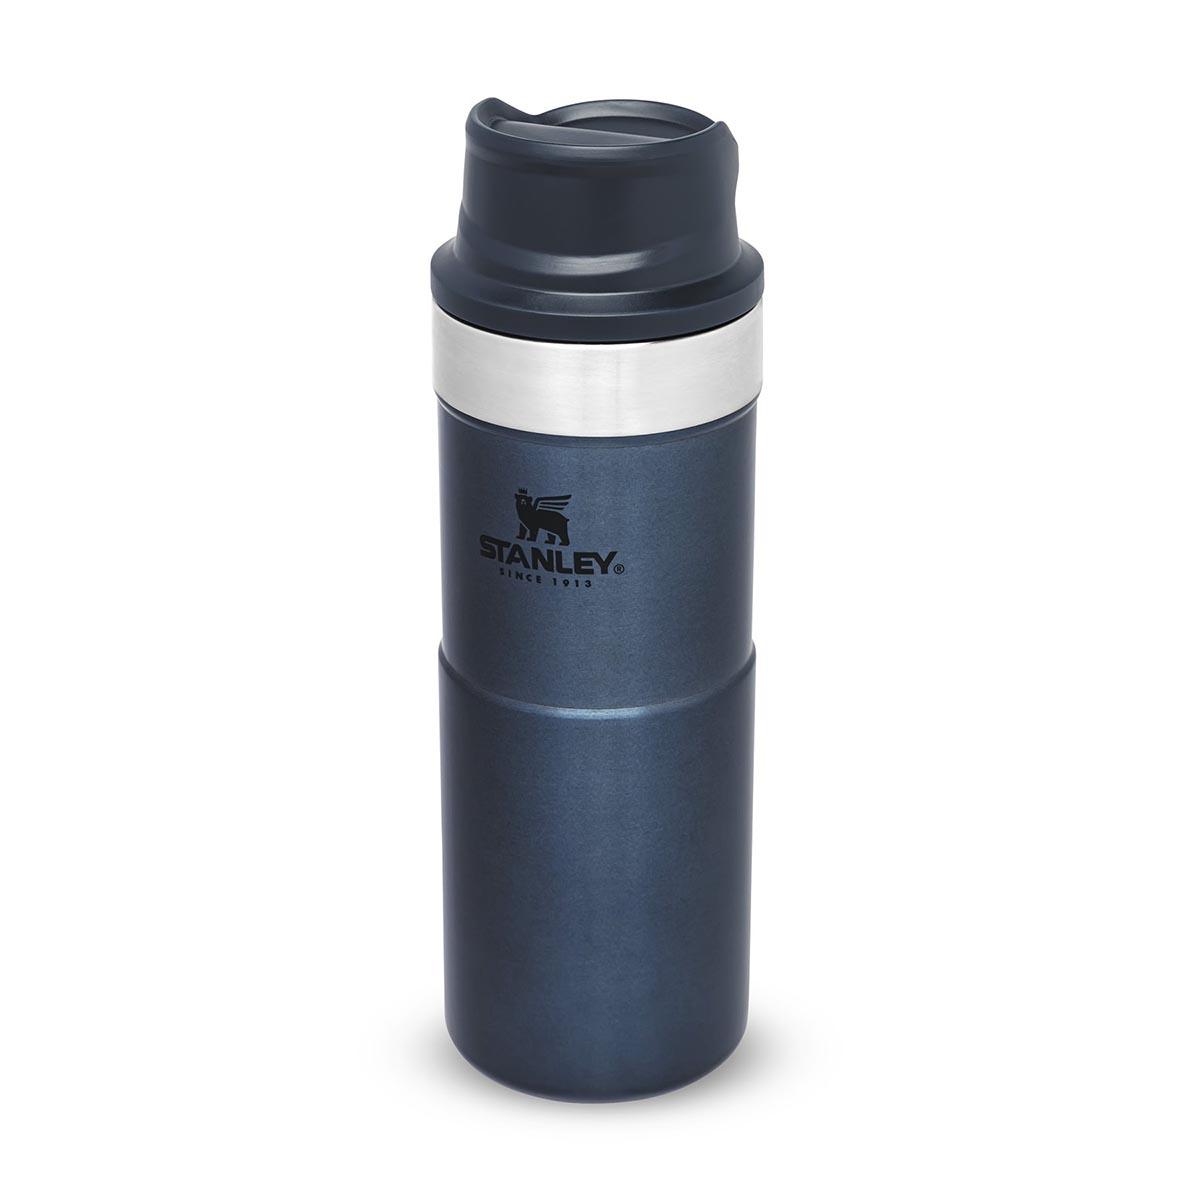 Stanley The Trigger-Action Travel Mug .35L / 12OZ AS1009848009